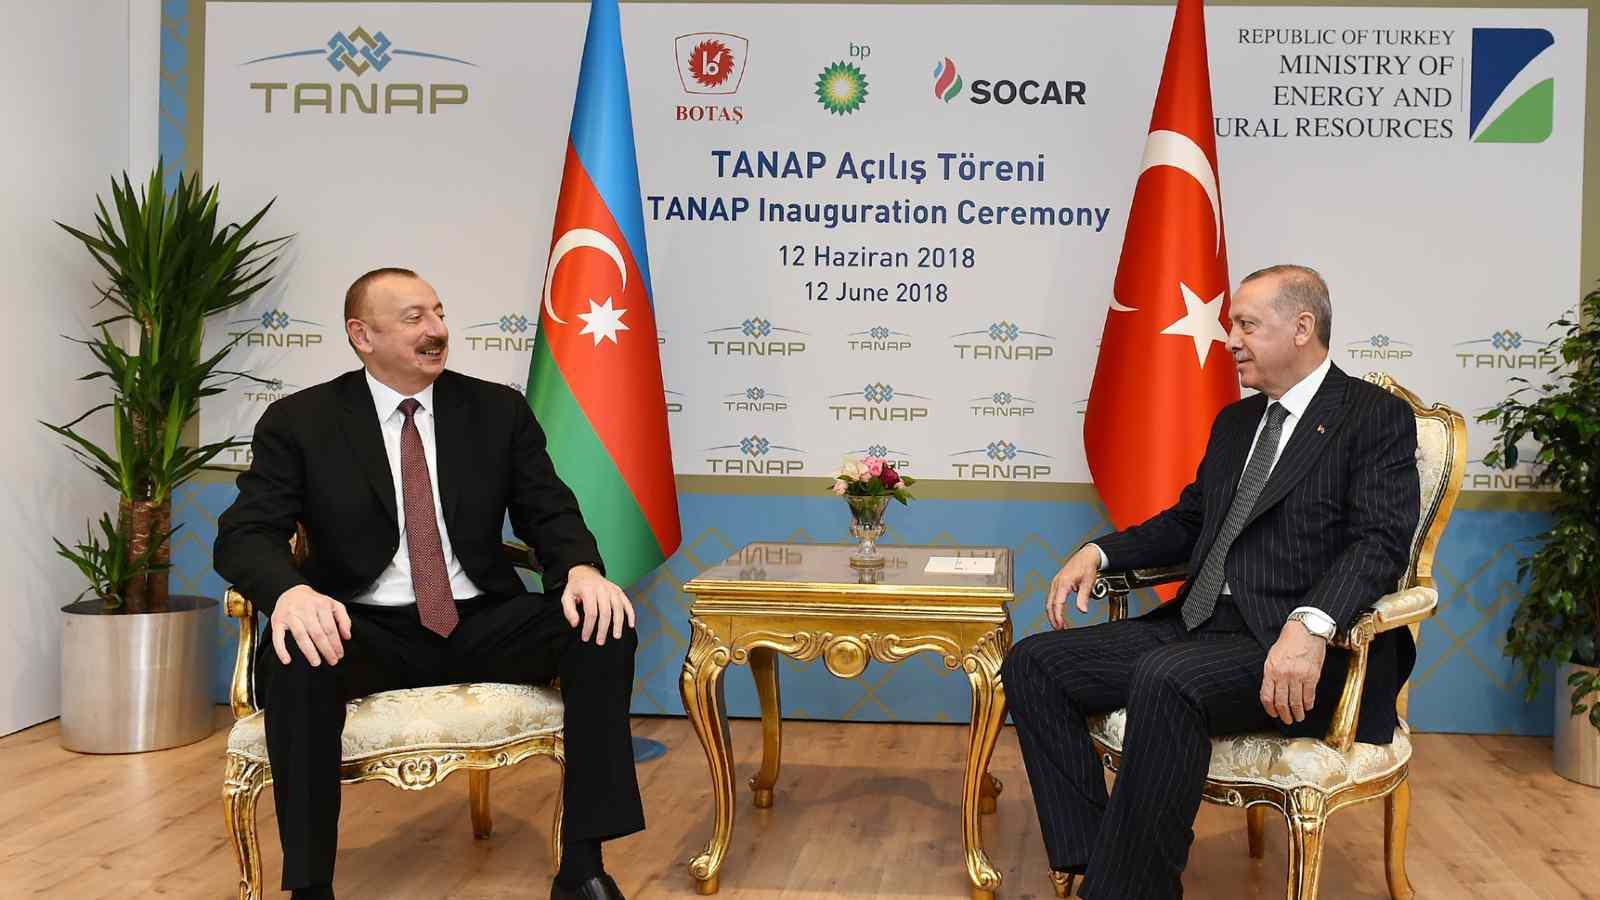 Photo: Ilham Aliyev met with Turkish President Recep Tayyip Erdogan in Eskisehir. June 8, 2018. Credit: Wikimedia Commons